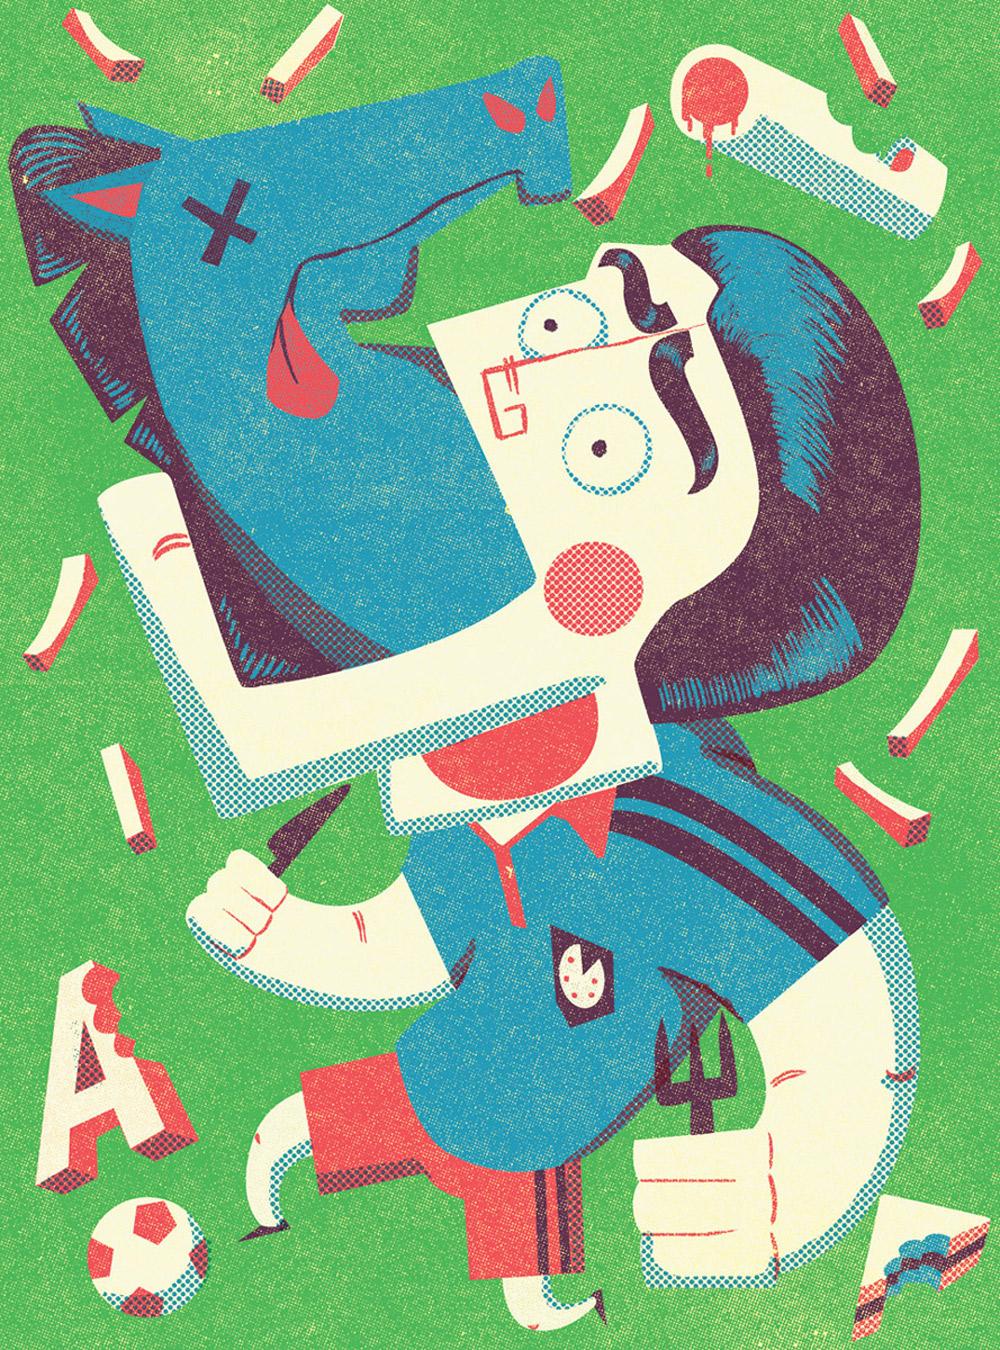 Editorial illustration for Pickles magazine, UK.